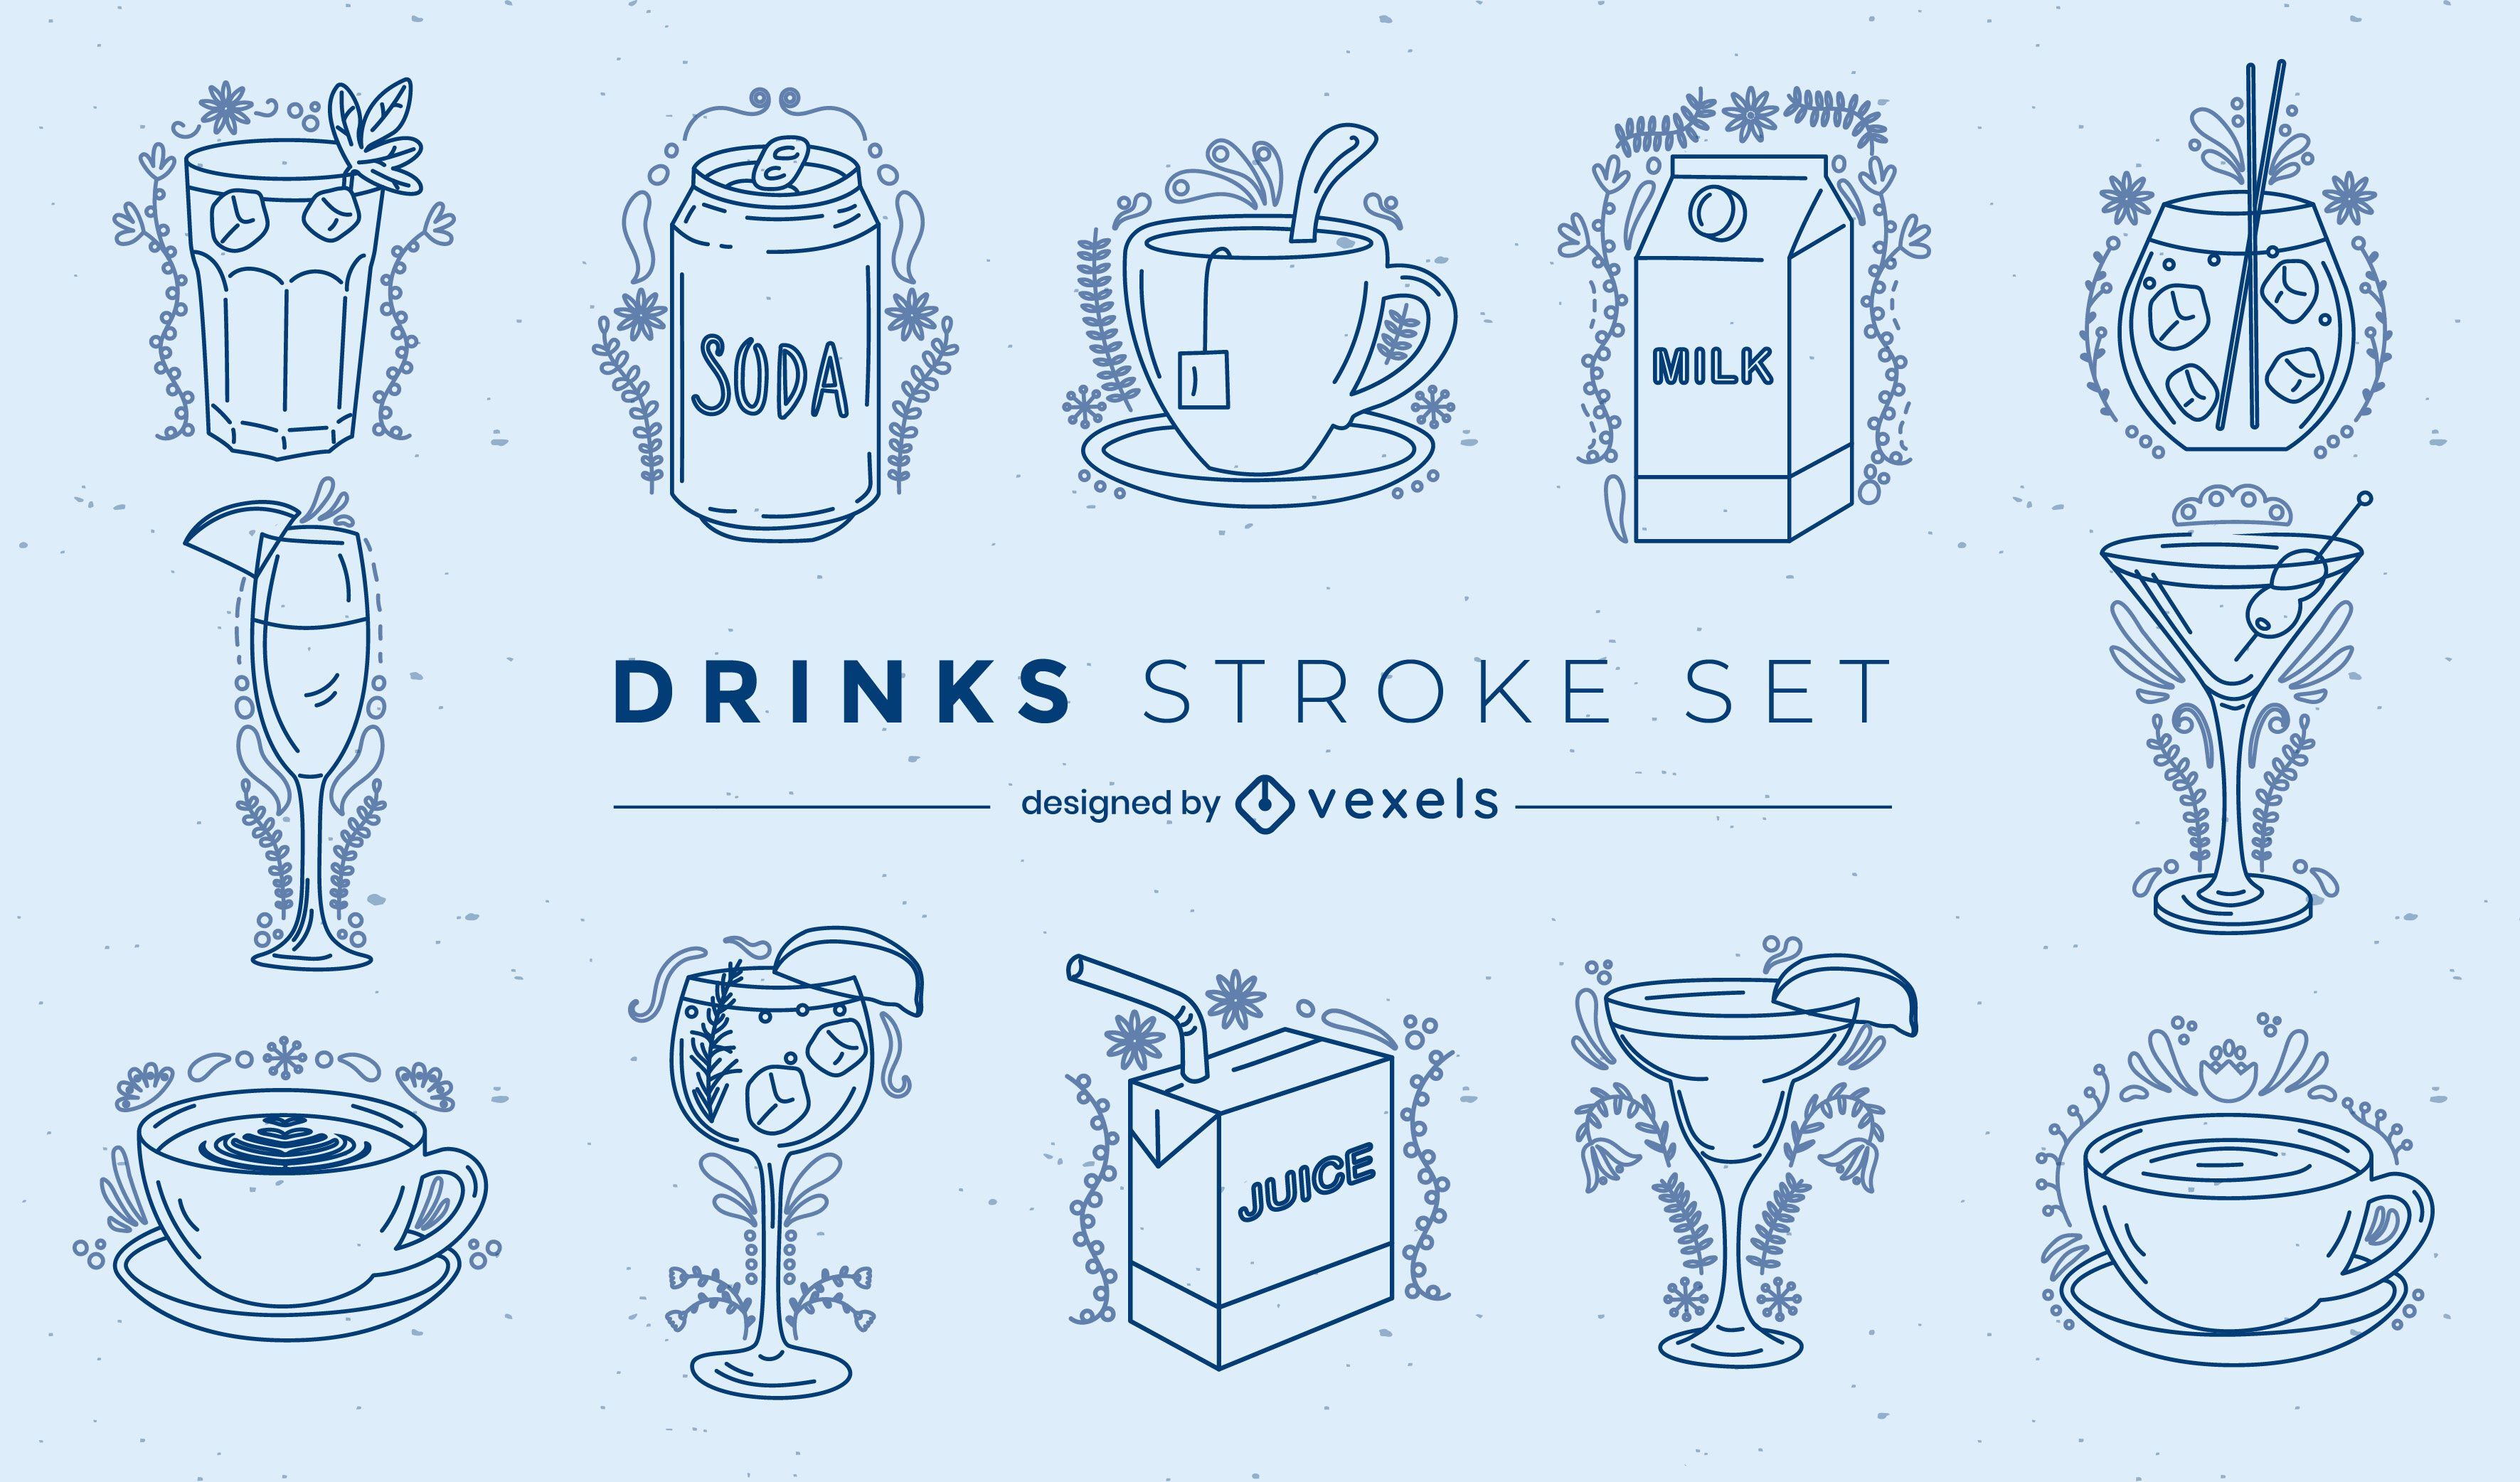 Drinks ornamented stroke set